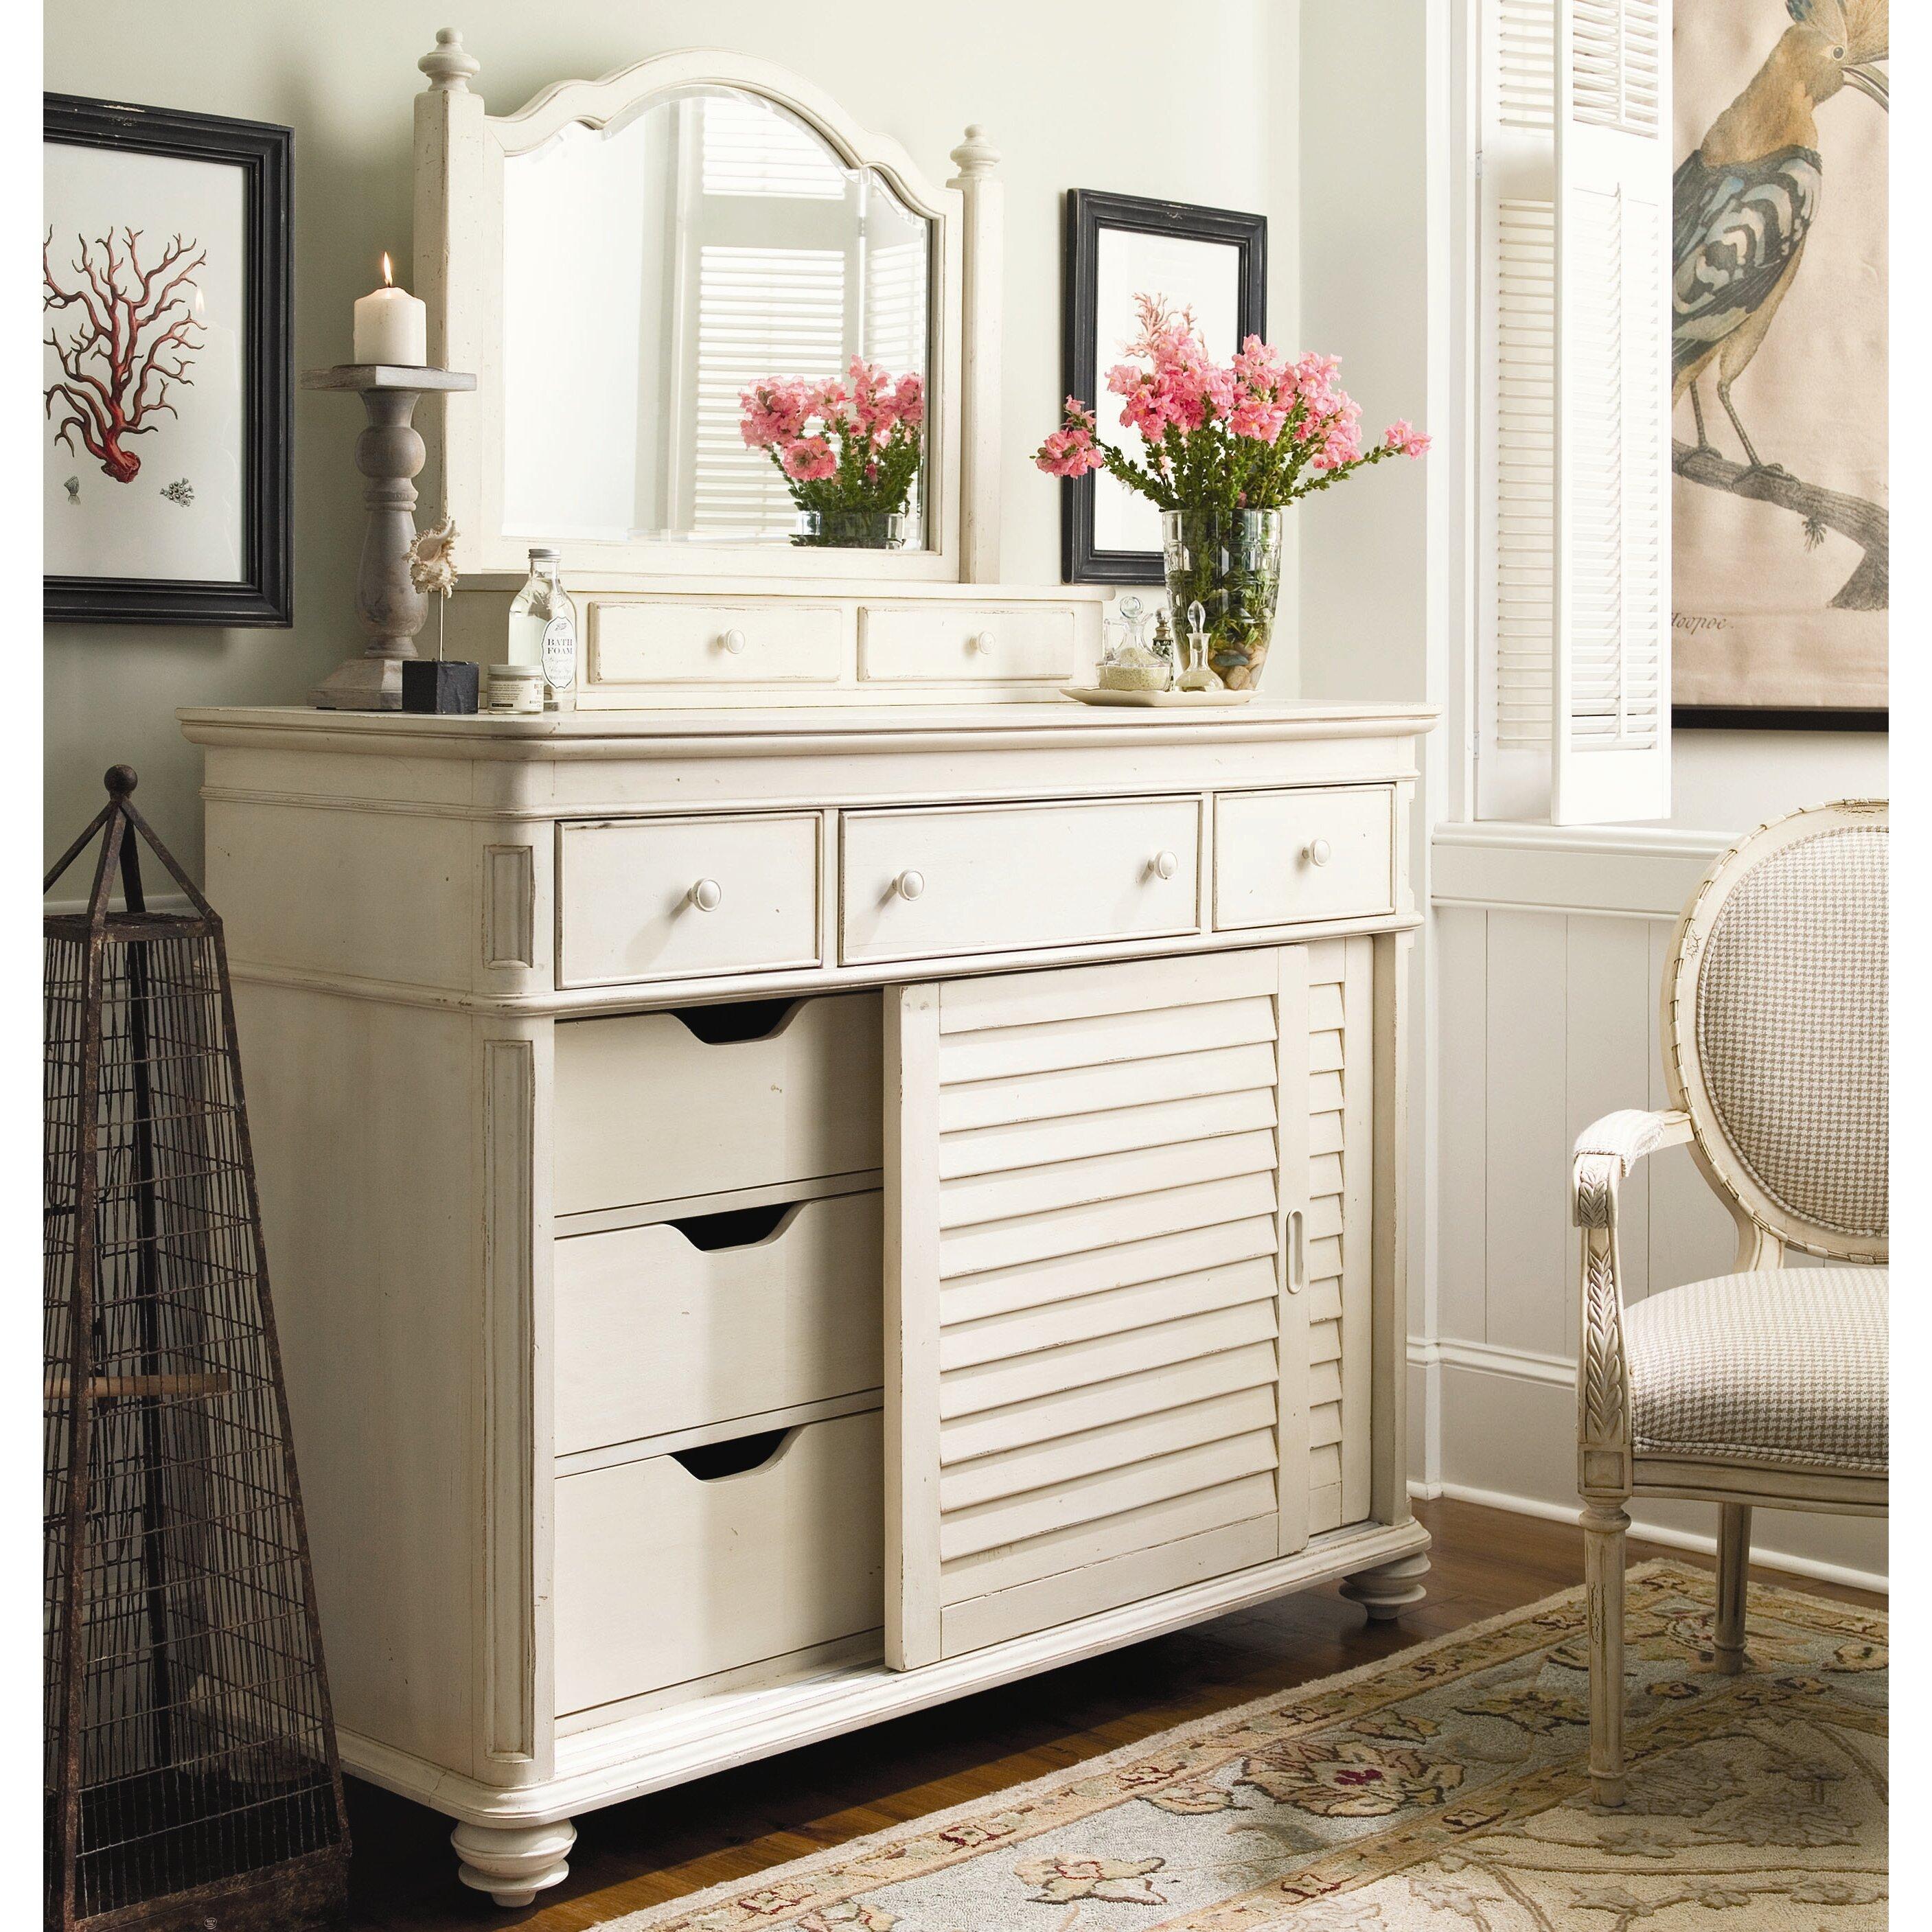 paula deen kitchen cabinets interior design ideas